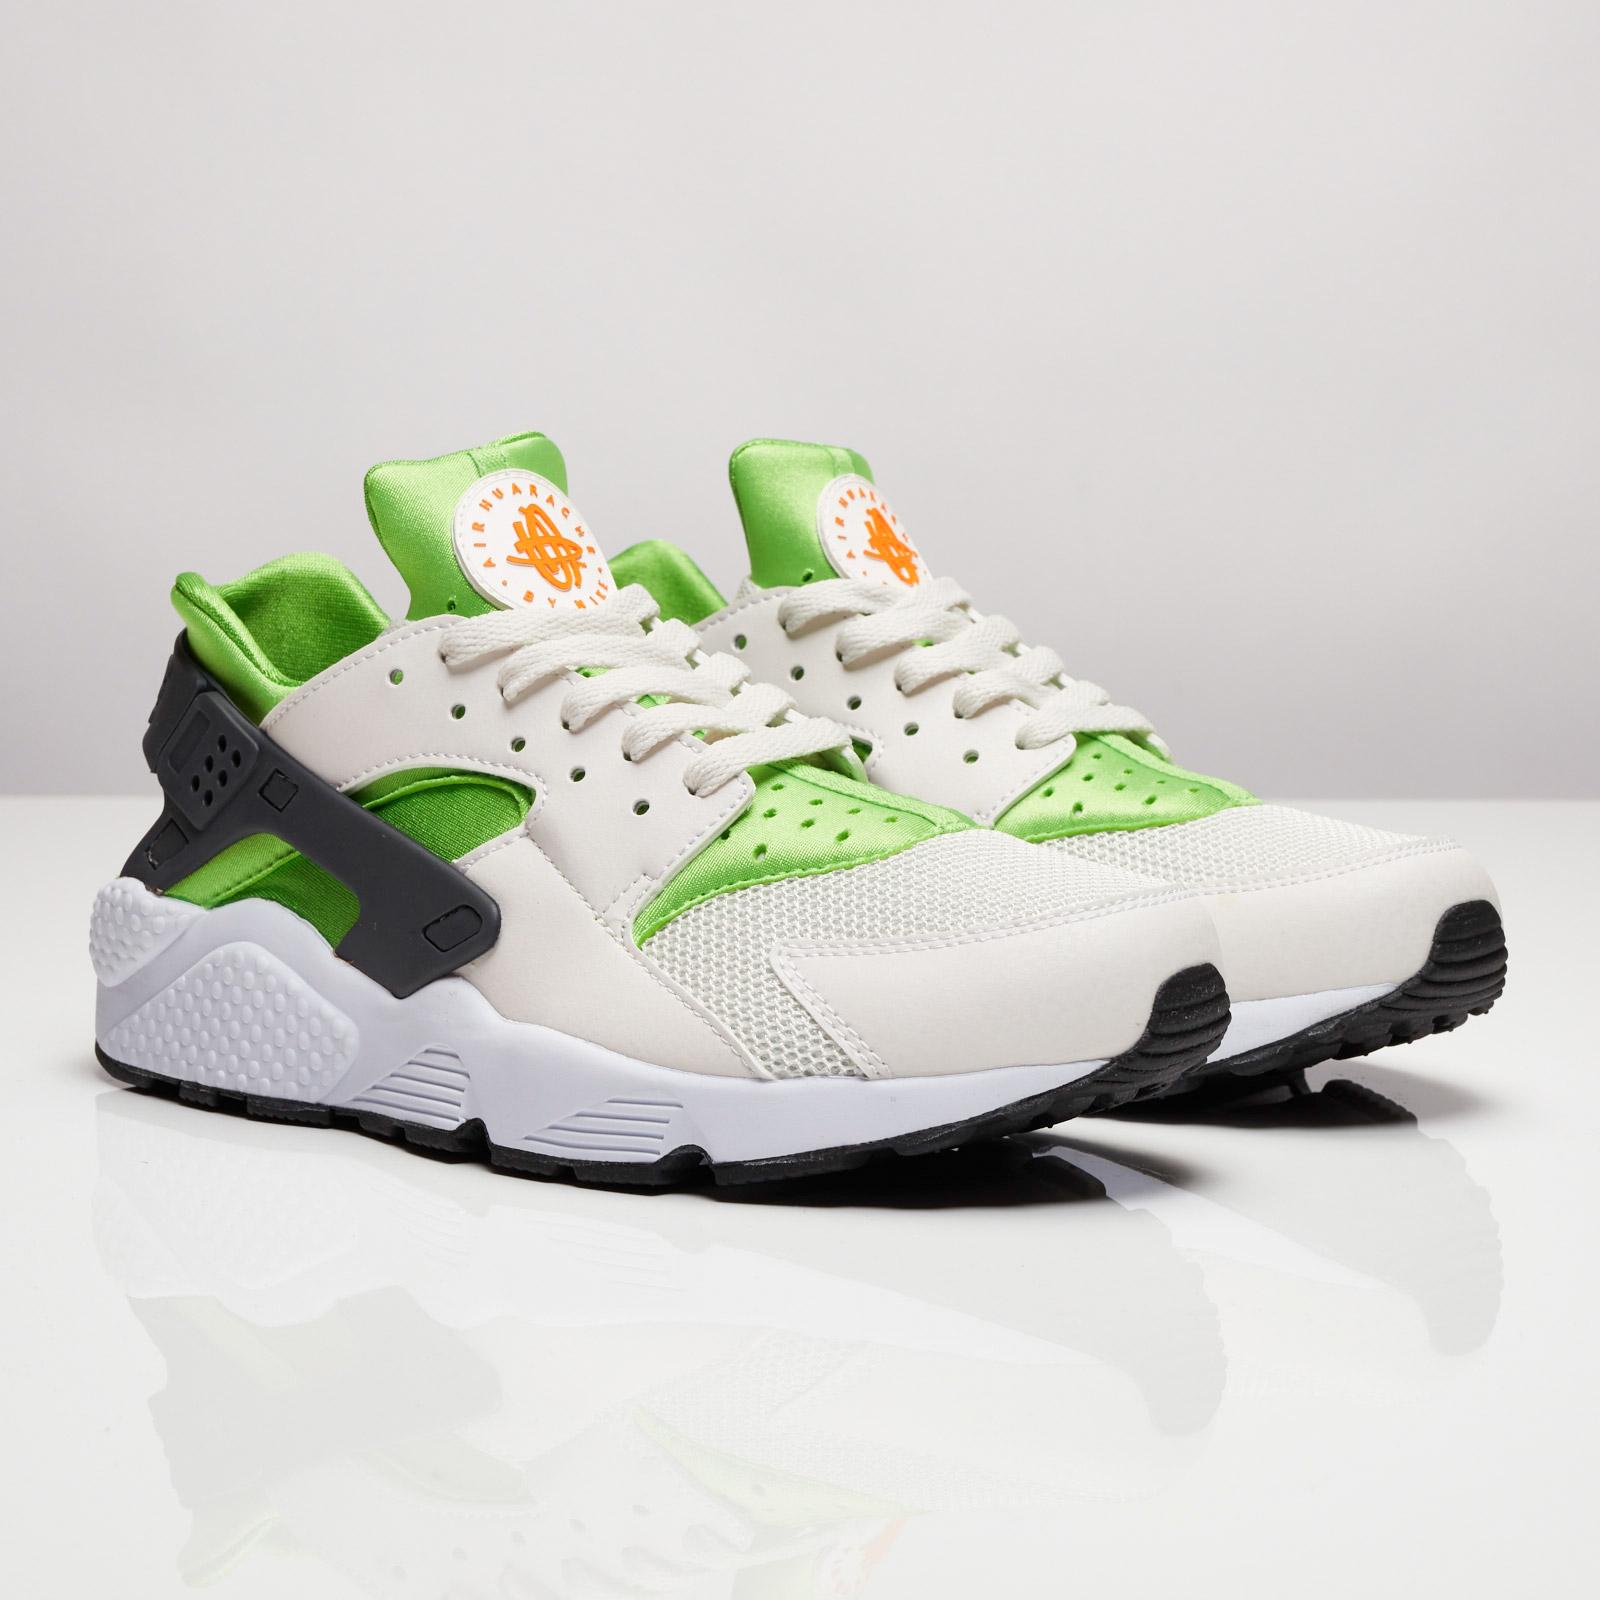 4ec0d798c8cbf Nike Air Huarache - 318429-304 - Sneakersnstuff